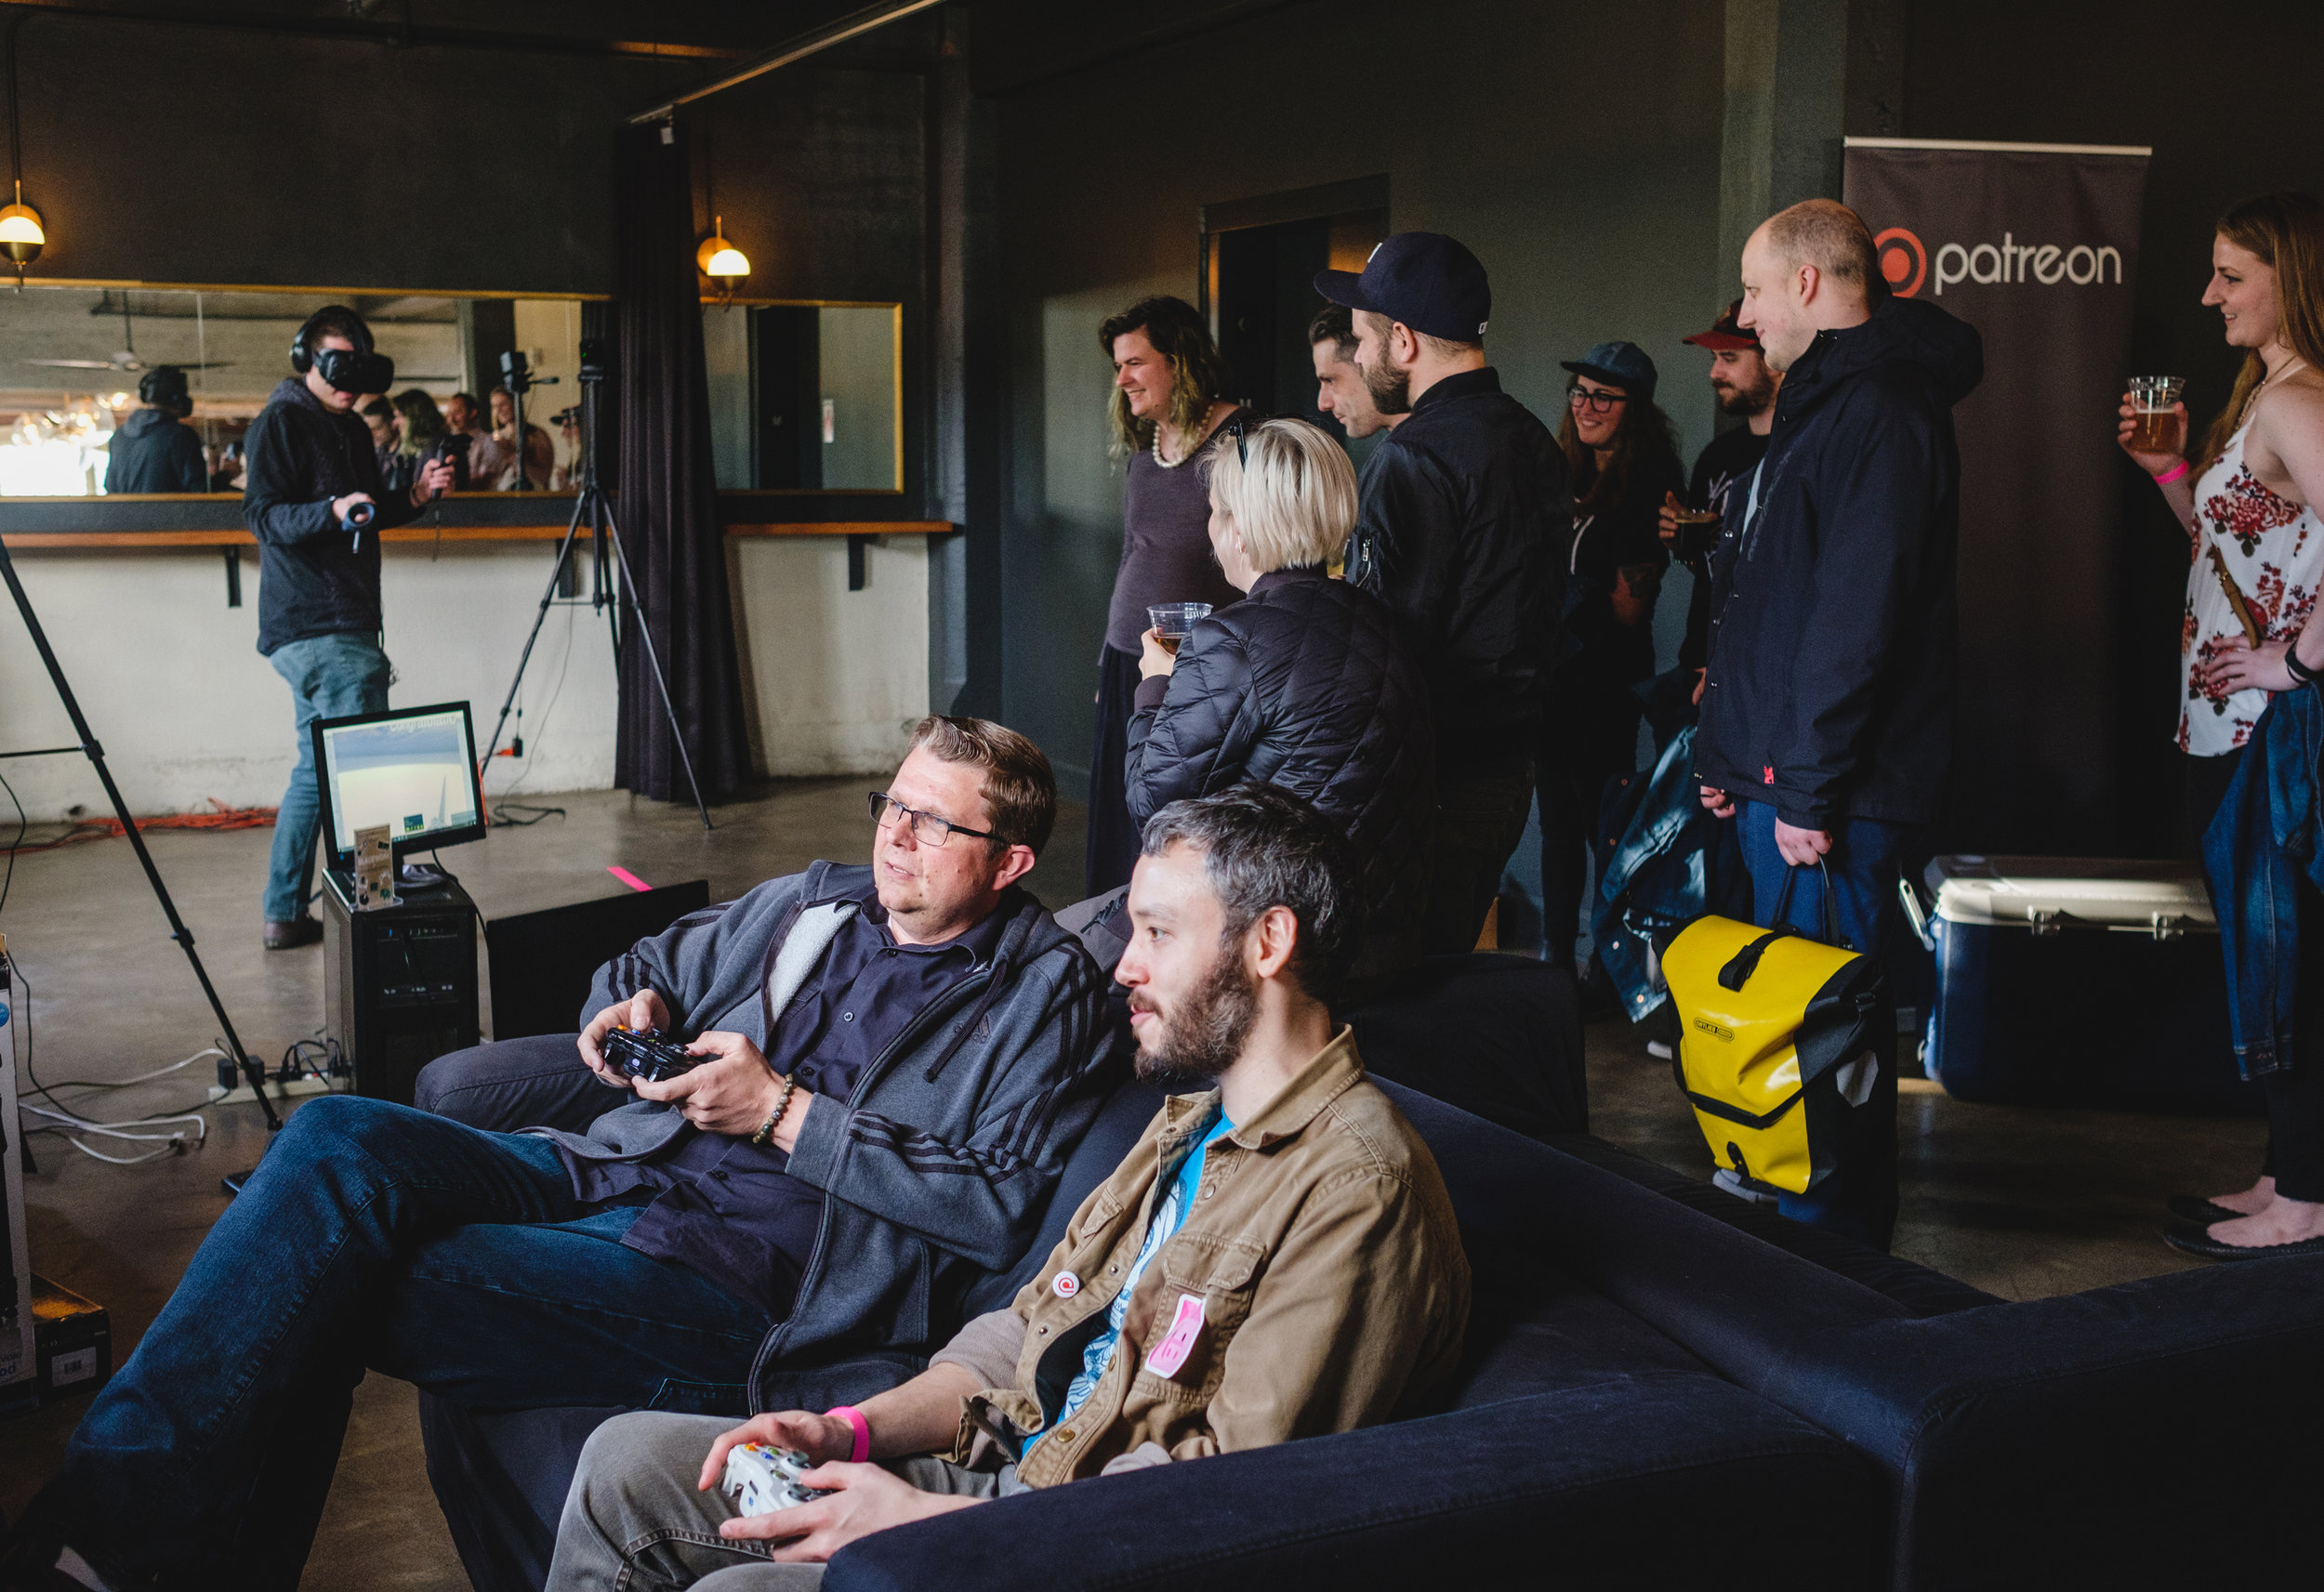 drink-n-draw--portland-indie-game-squad--patreon--design-week-portland_33957674000_o.jpg